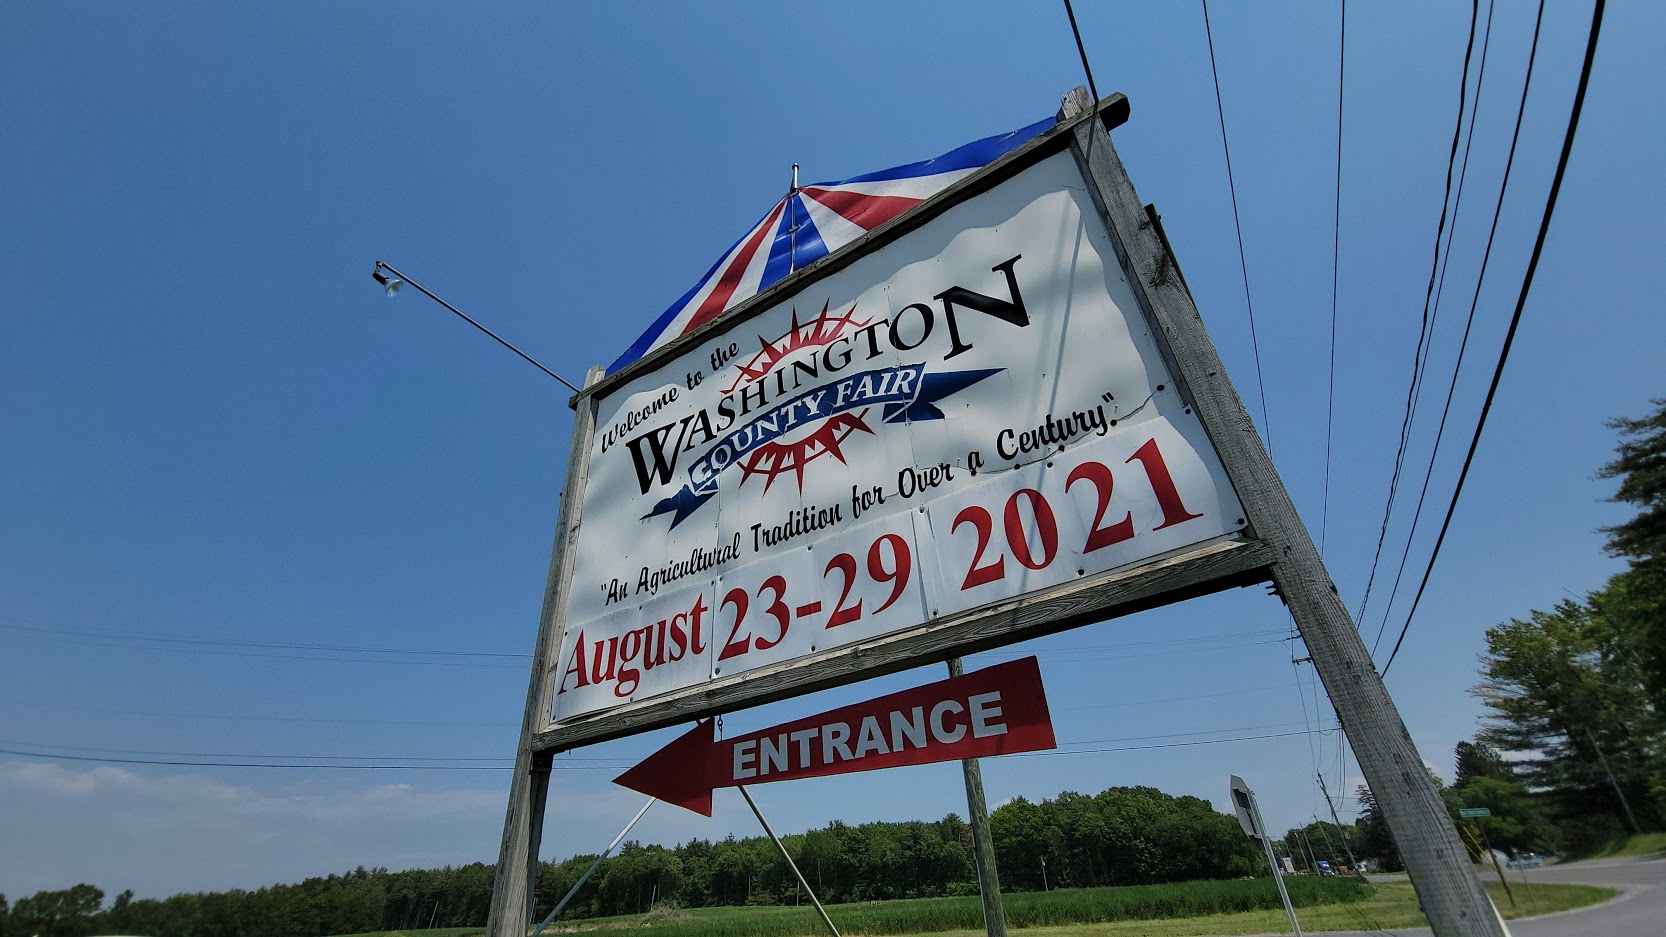 washington county fair sign